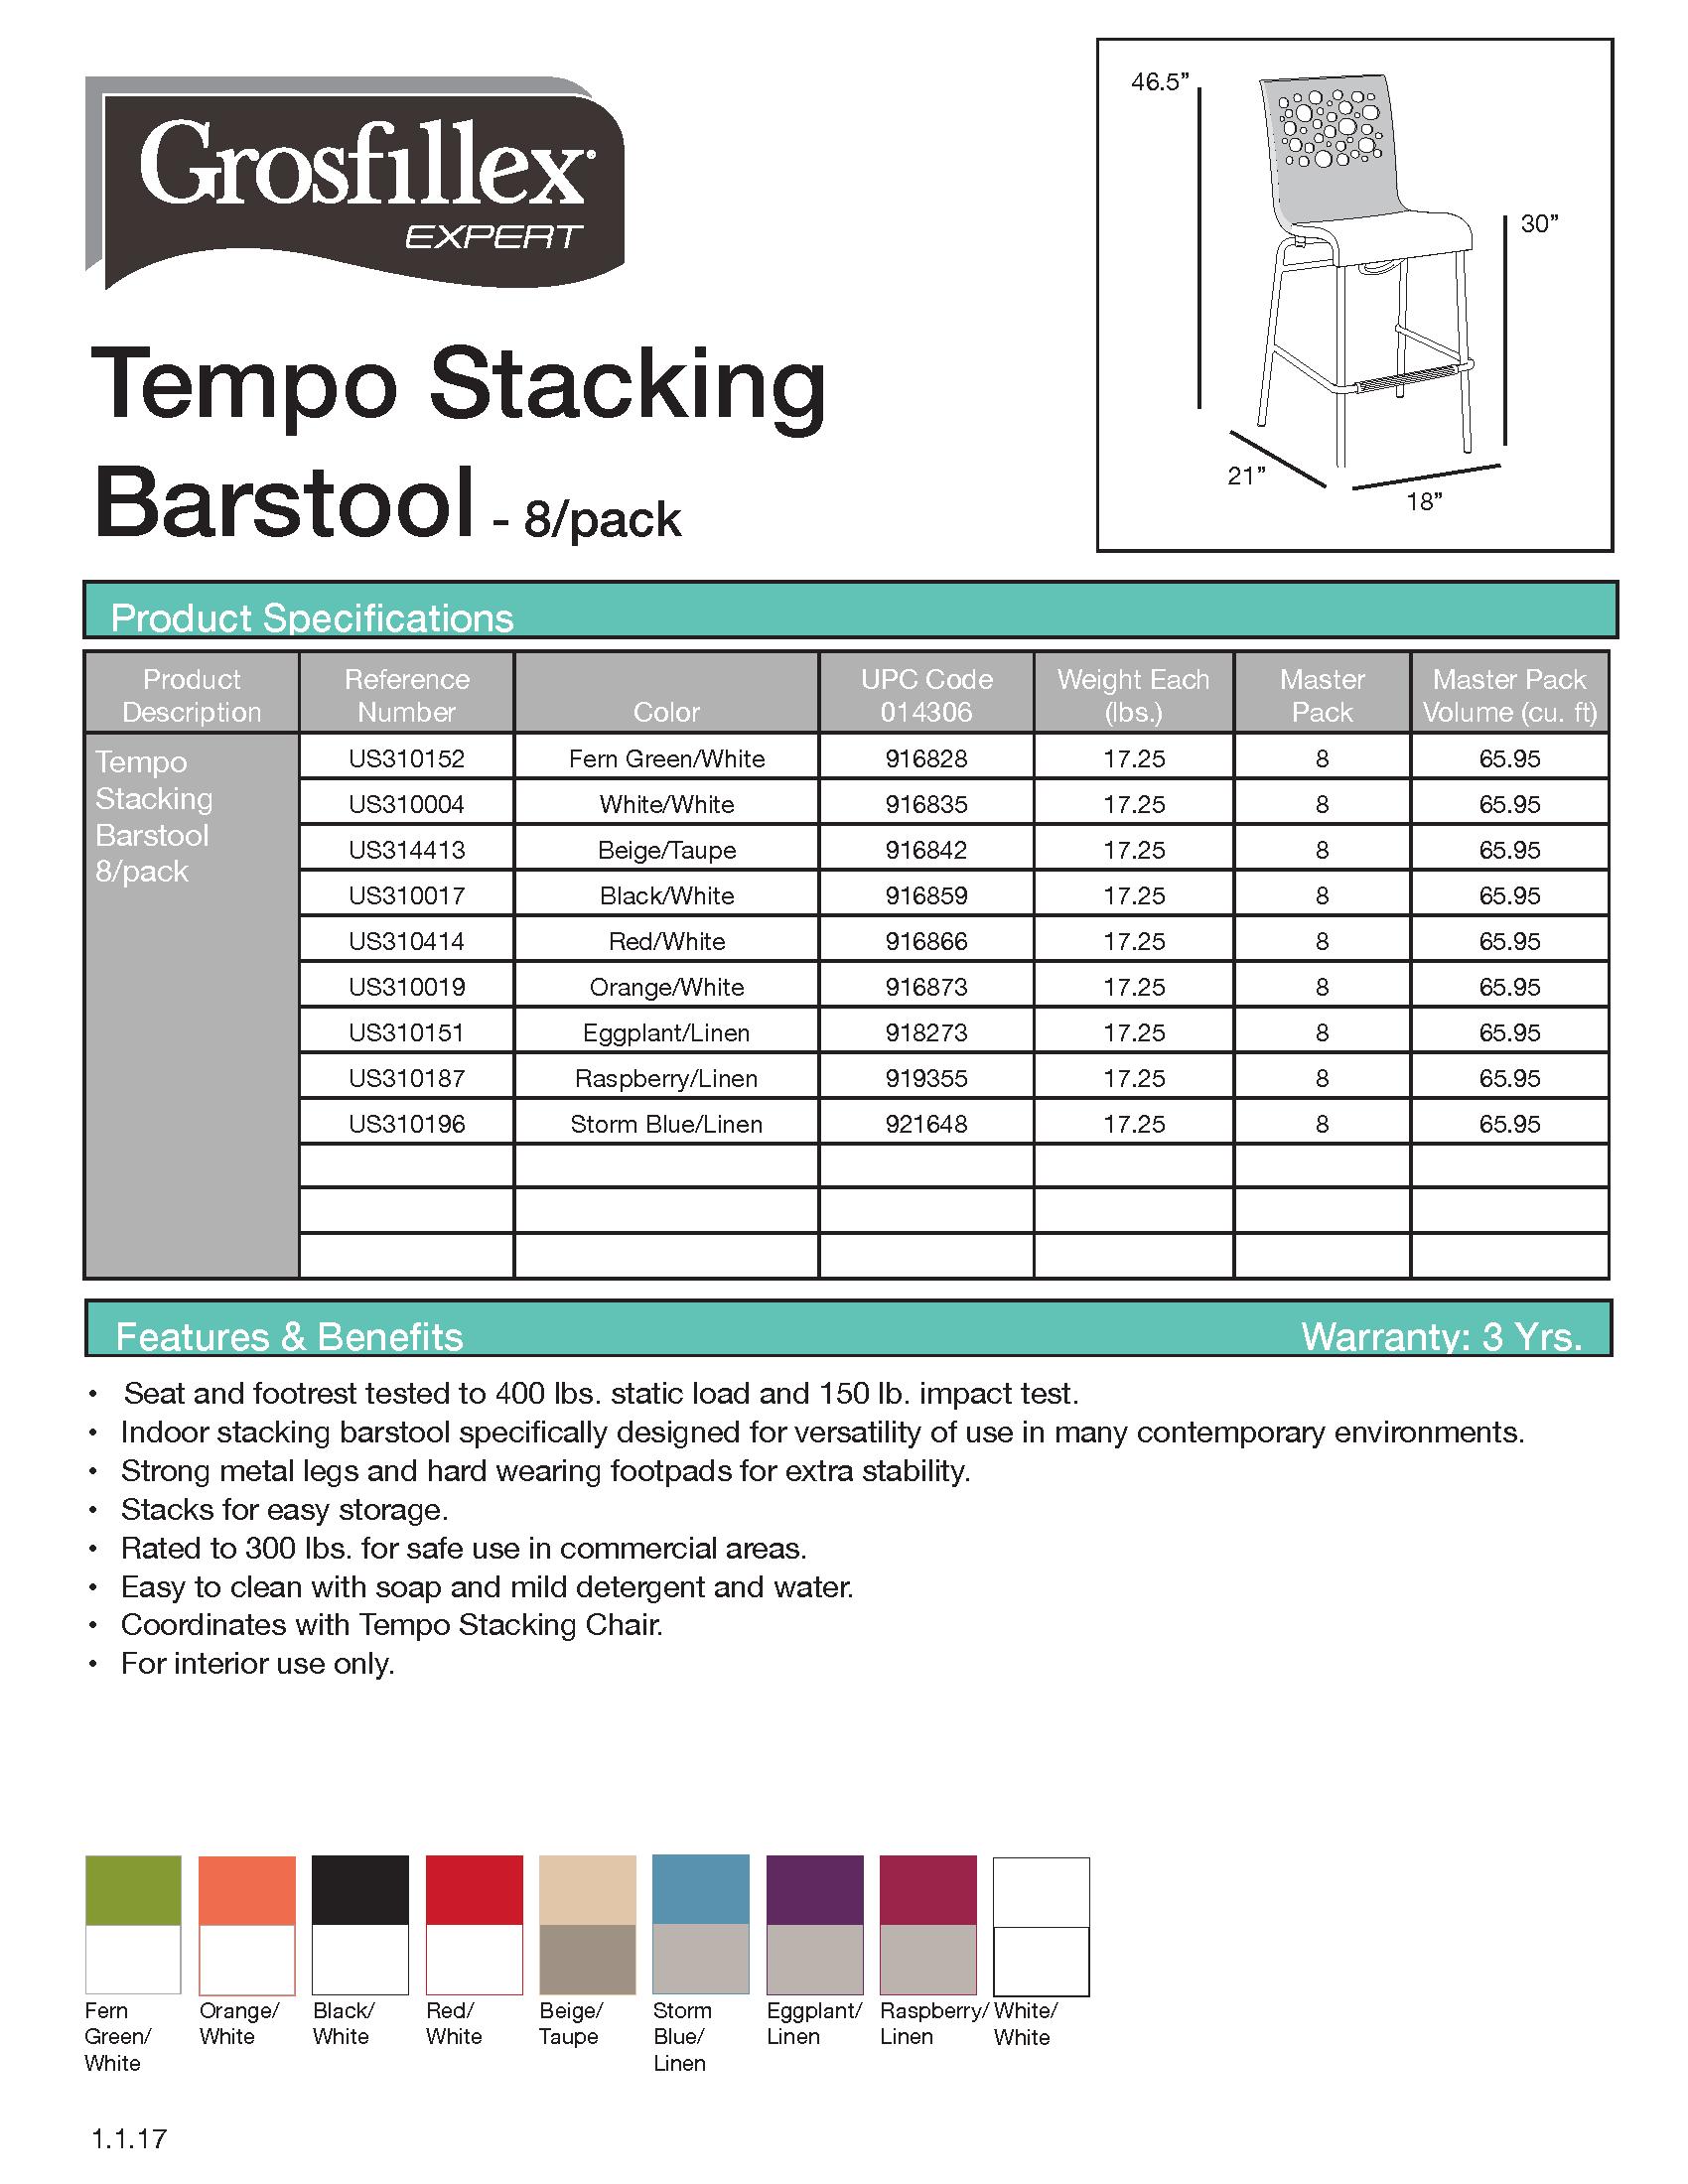 Tempo Barstool 8-pack